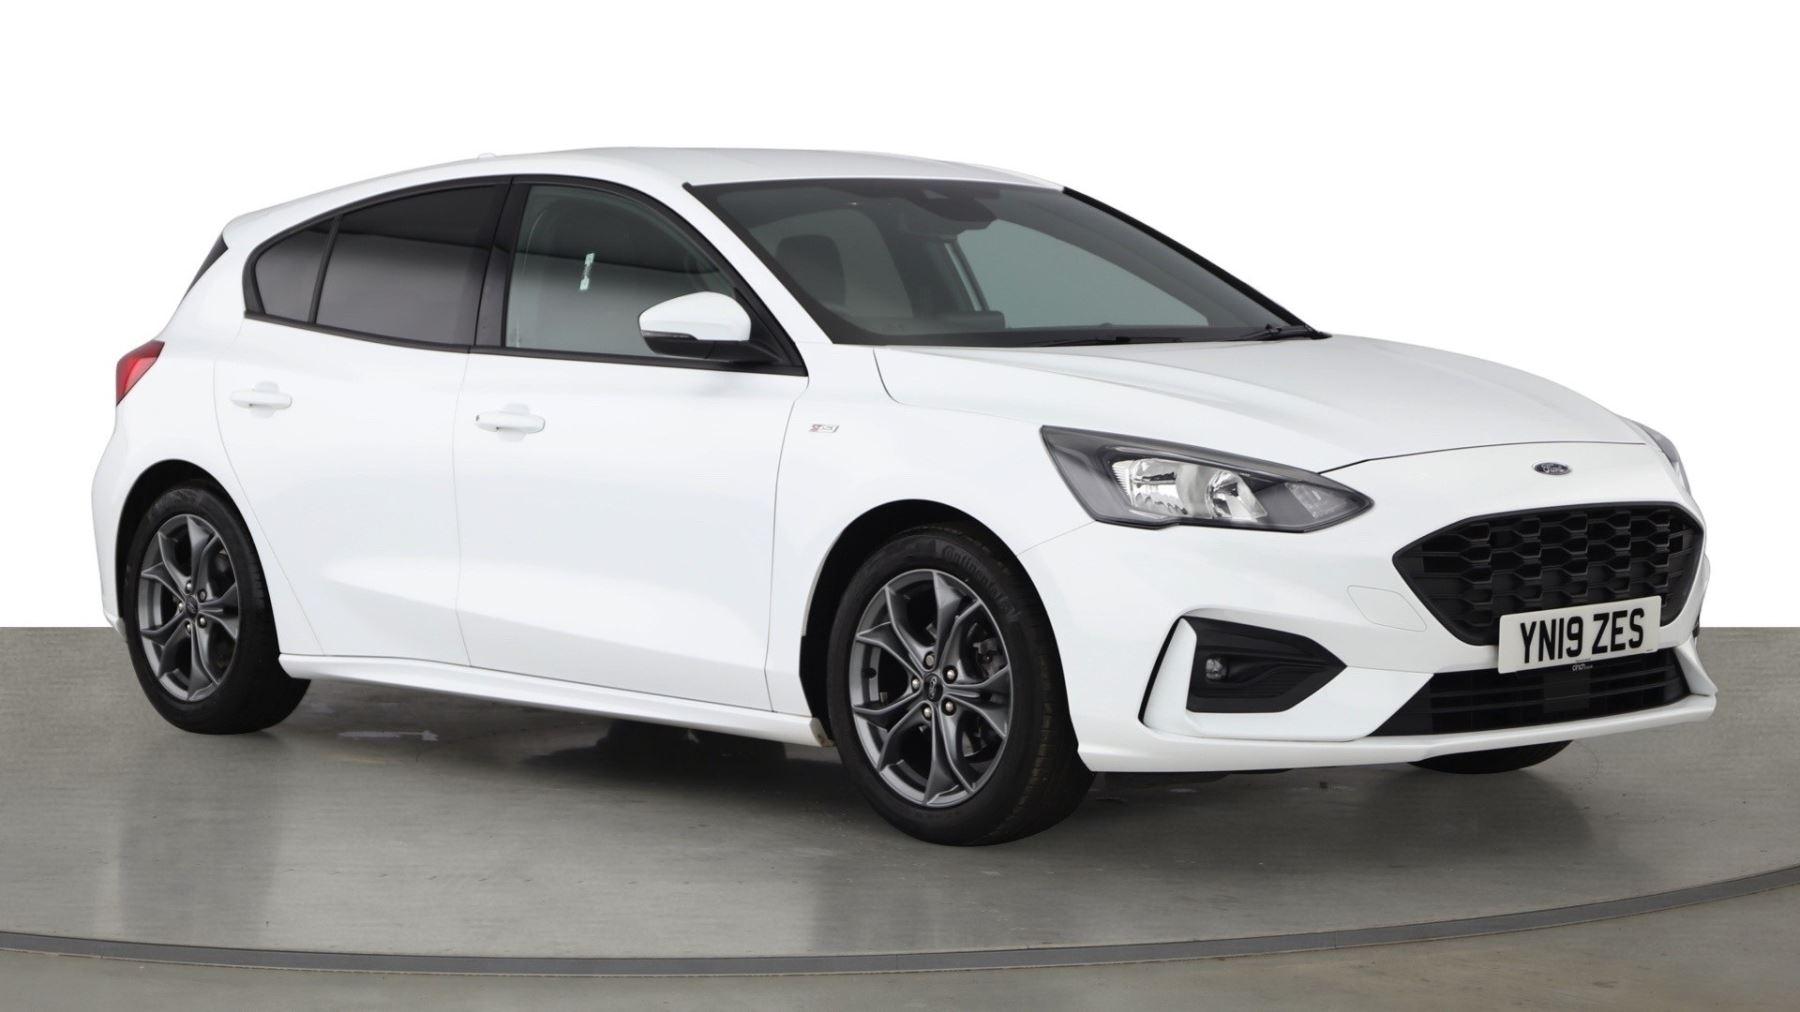 Ford Focus 1.0 EcoBoost 125 ST-Line 5dr with Navigation and Keyless Start Hatchback (2019)